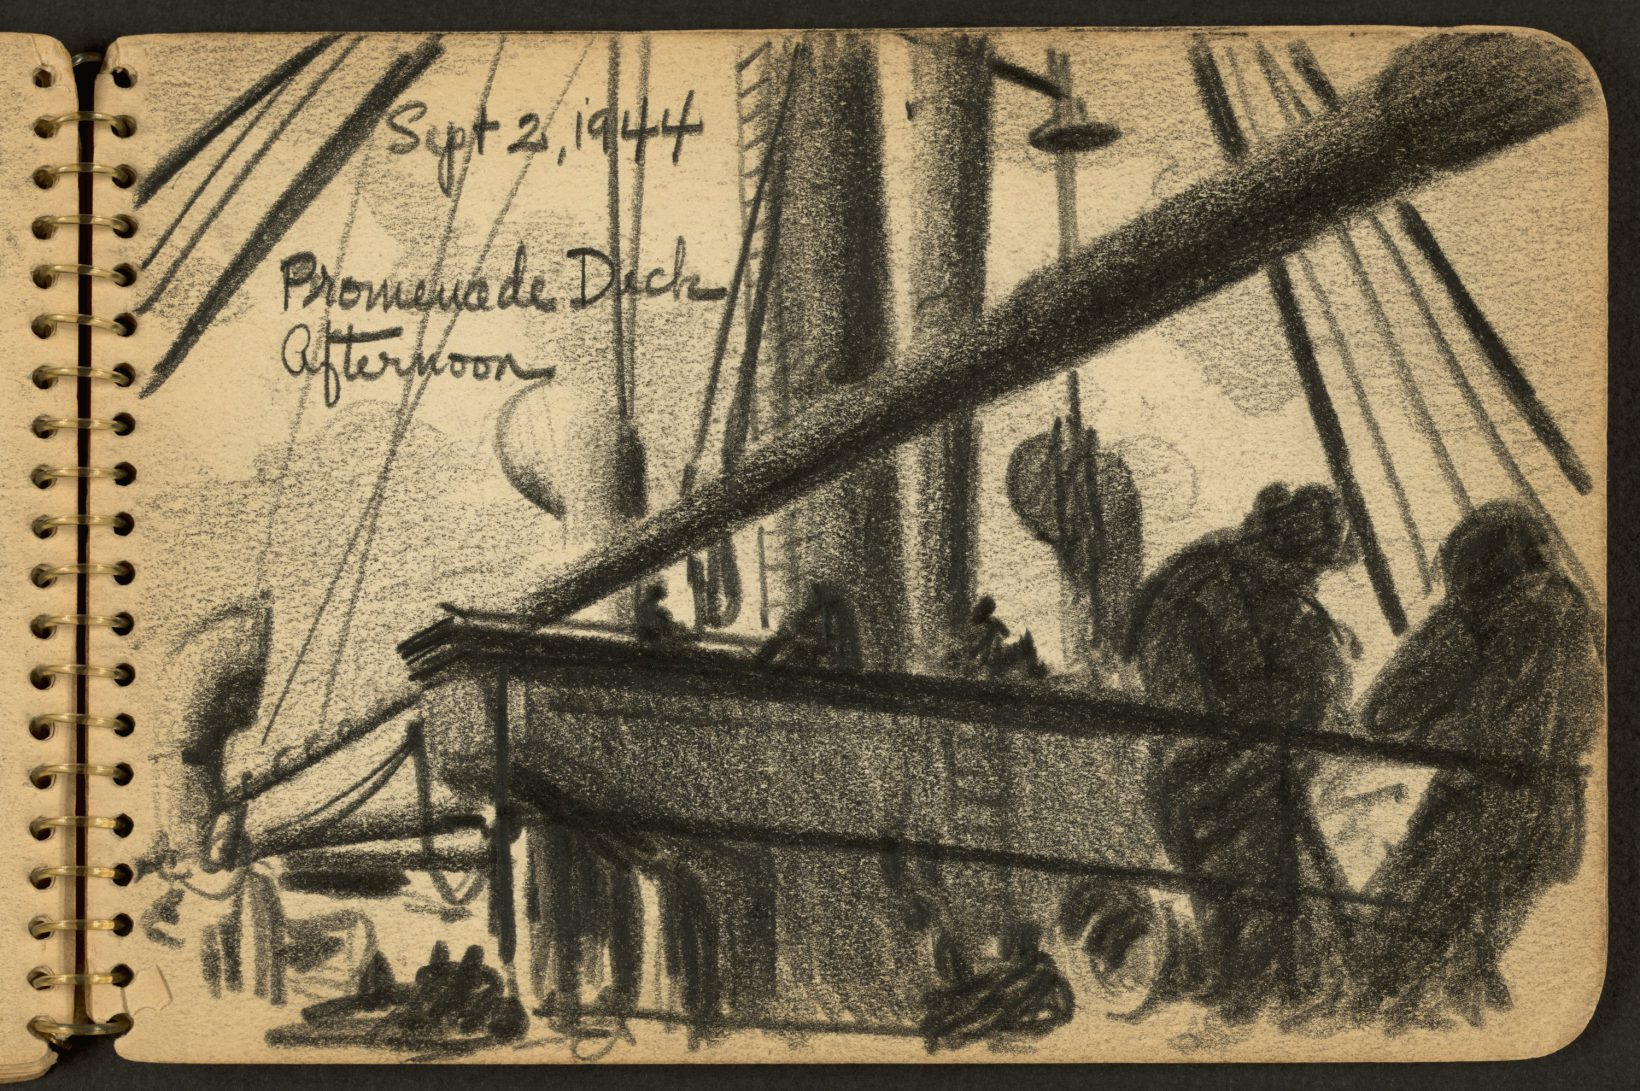 victor-lundy-carnet-croquis-seconde-guerre-mondiale-41